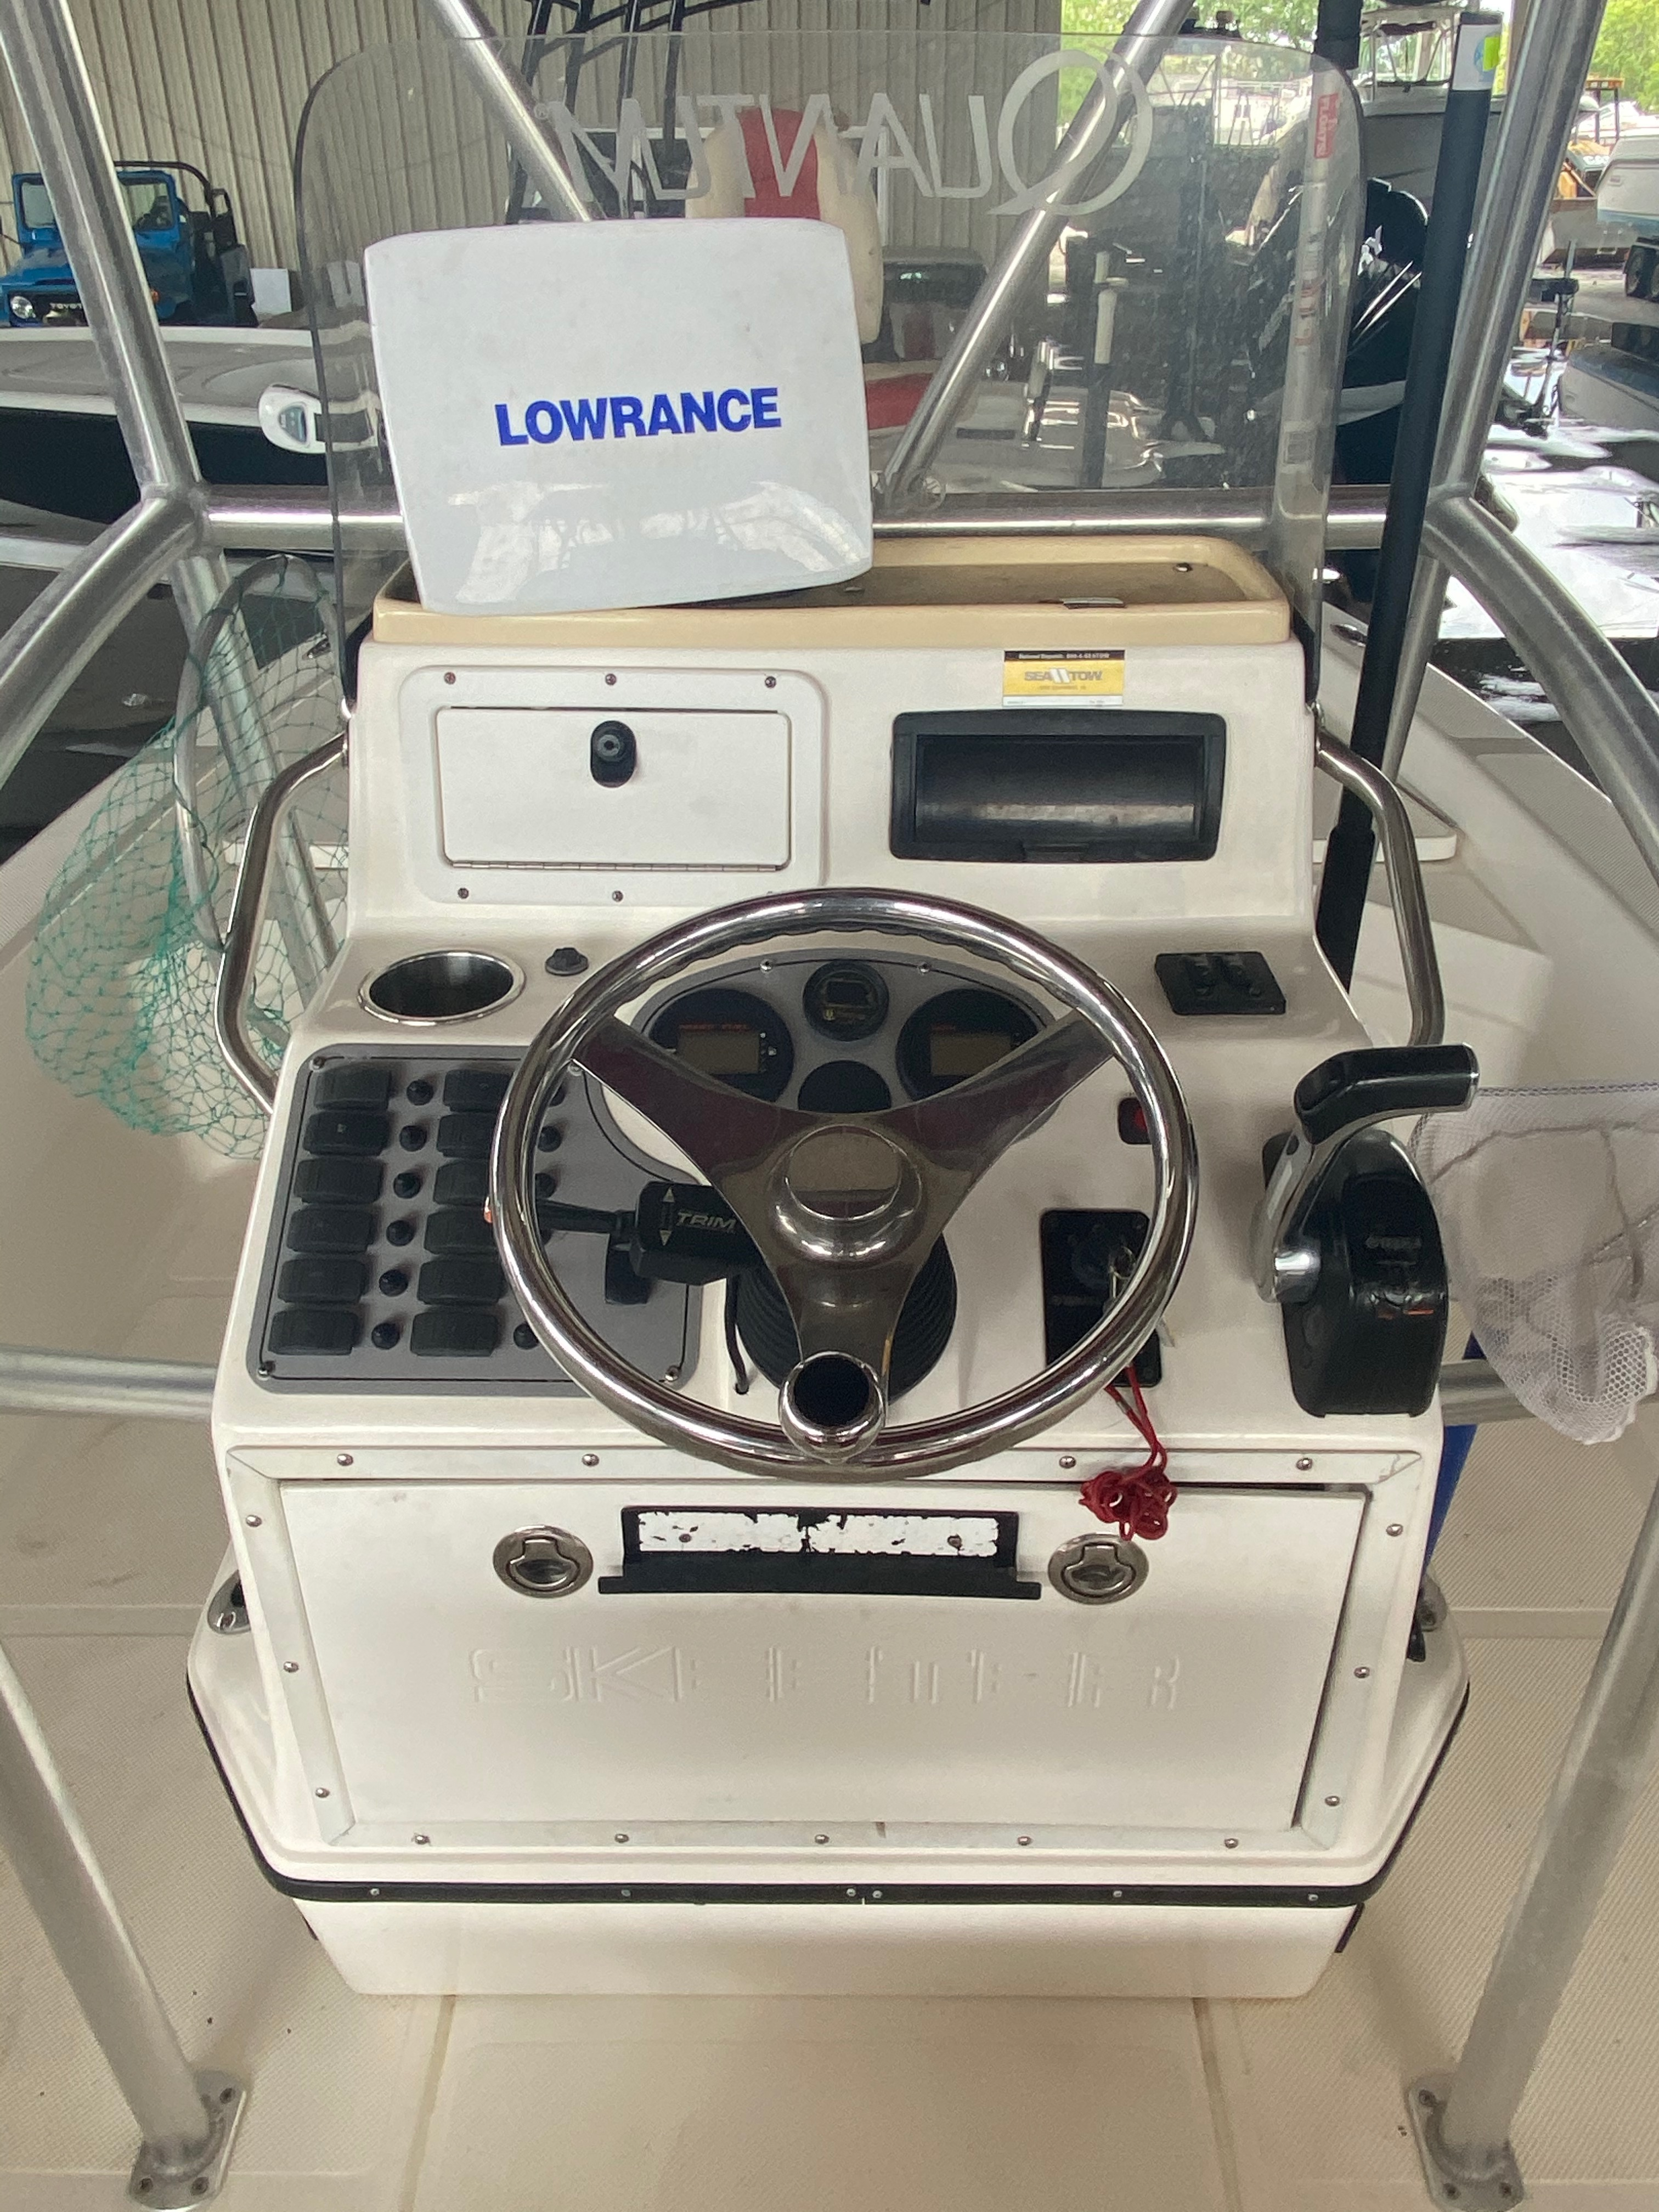 2010 Skeeter boat for sale, model of the boat is ZX24V & Image # 13 of 16